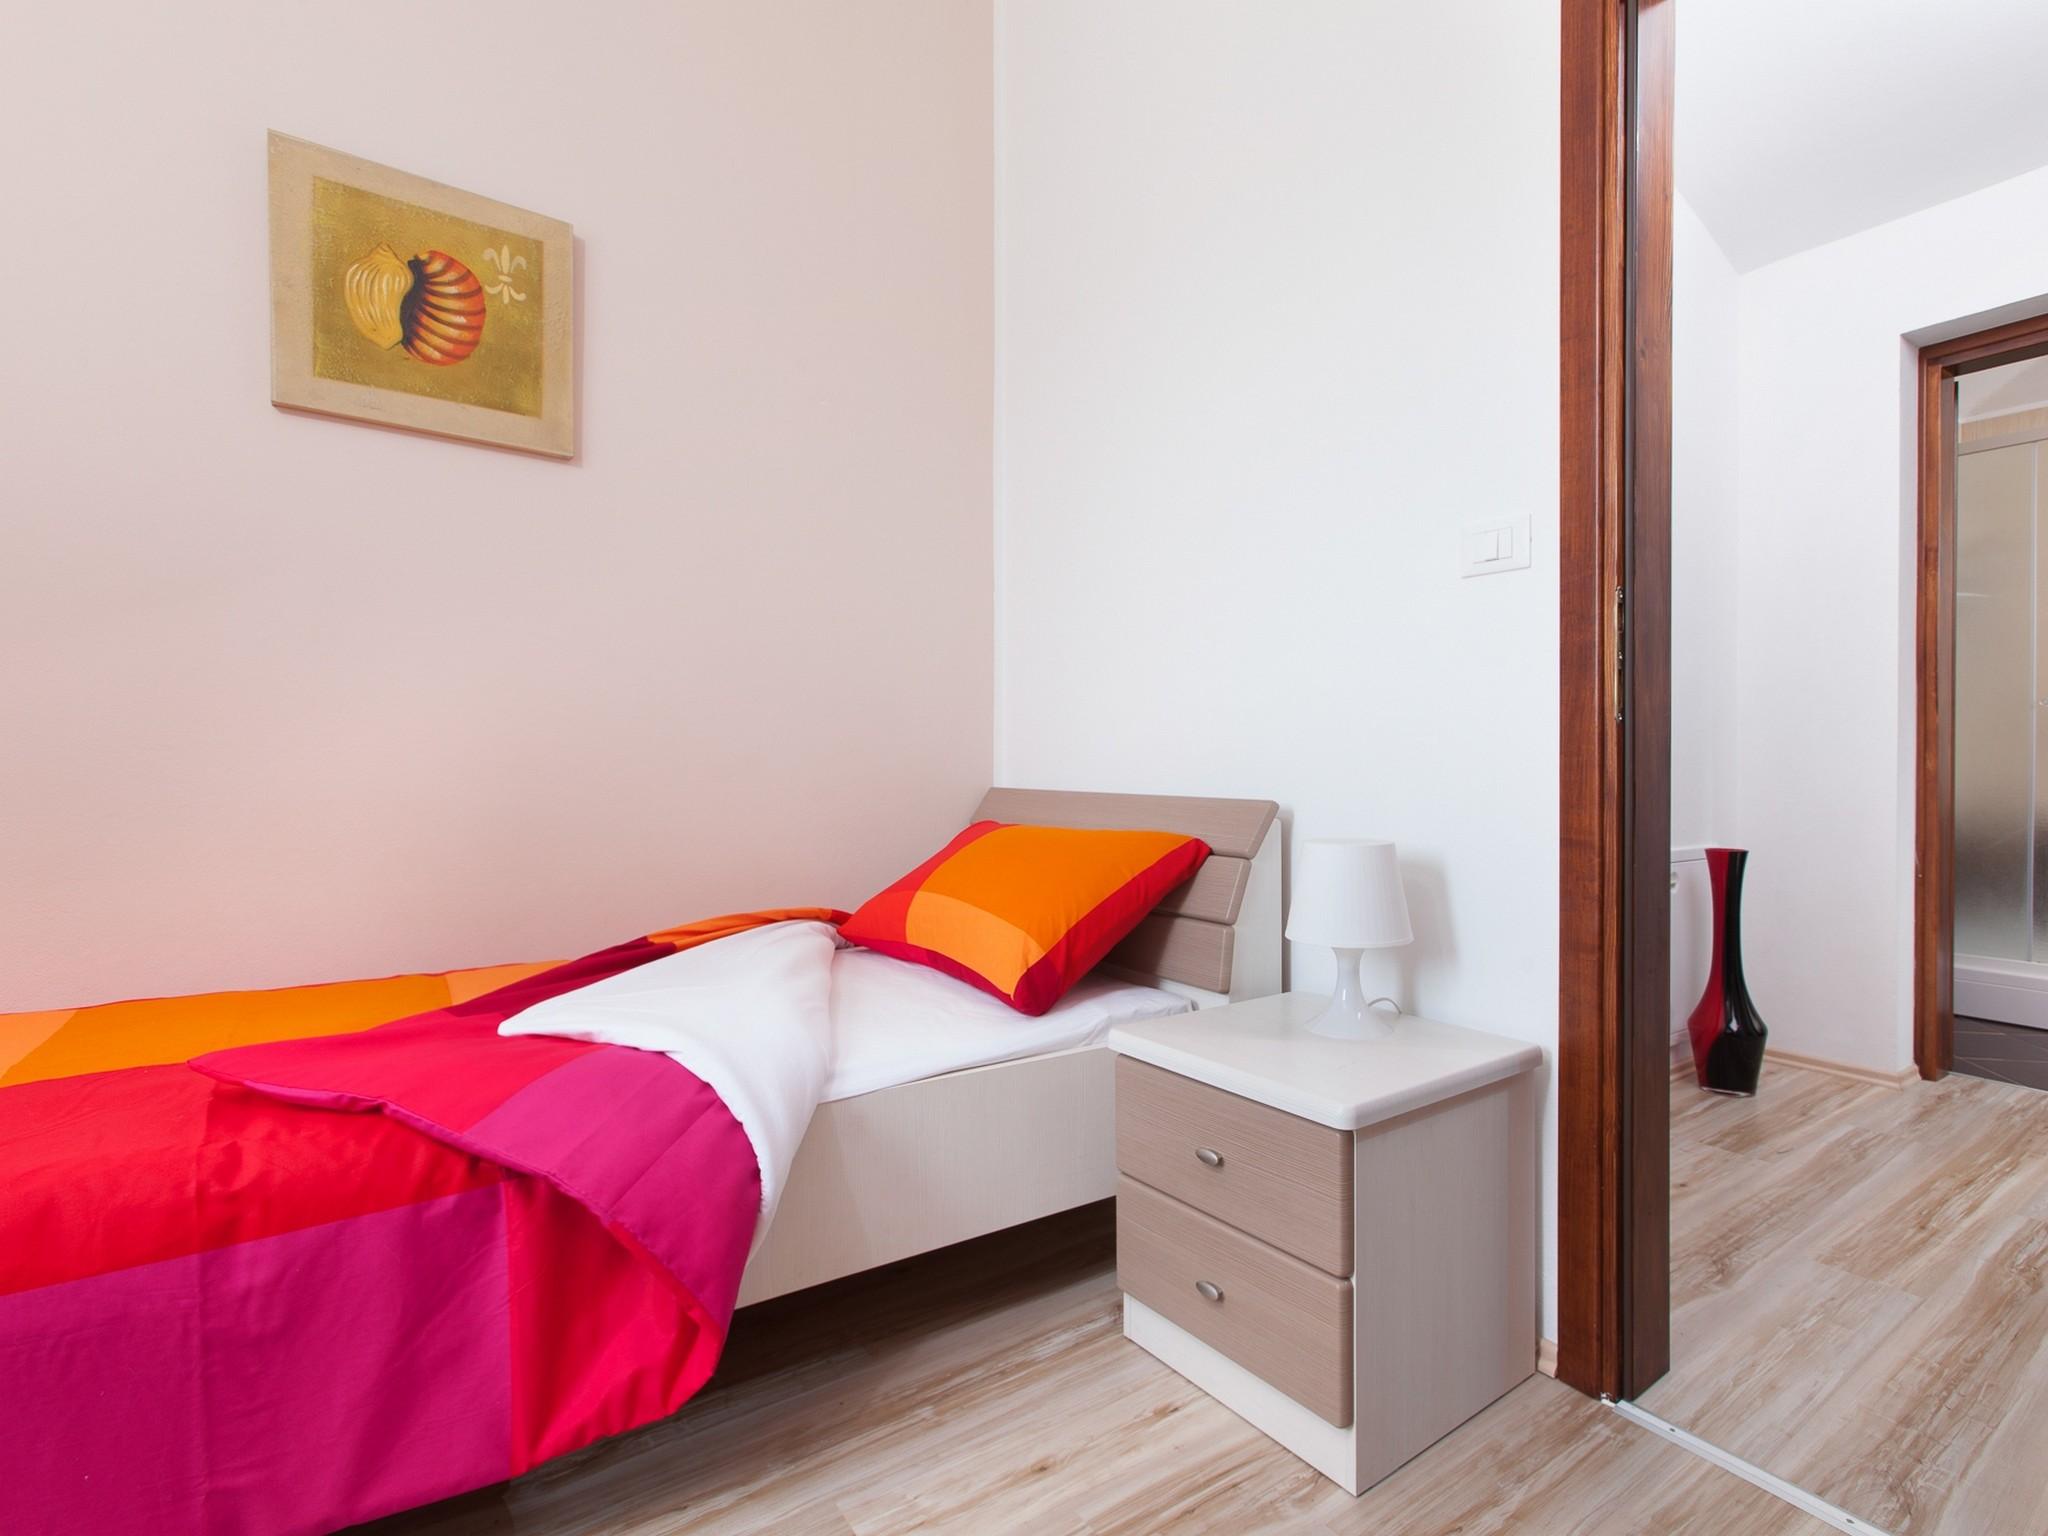 Ferienhaus Bruno, Kua za odmor s bazenom (2204668), Mugeba, , Istrien, Kroatien, Bild 14